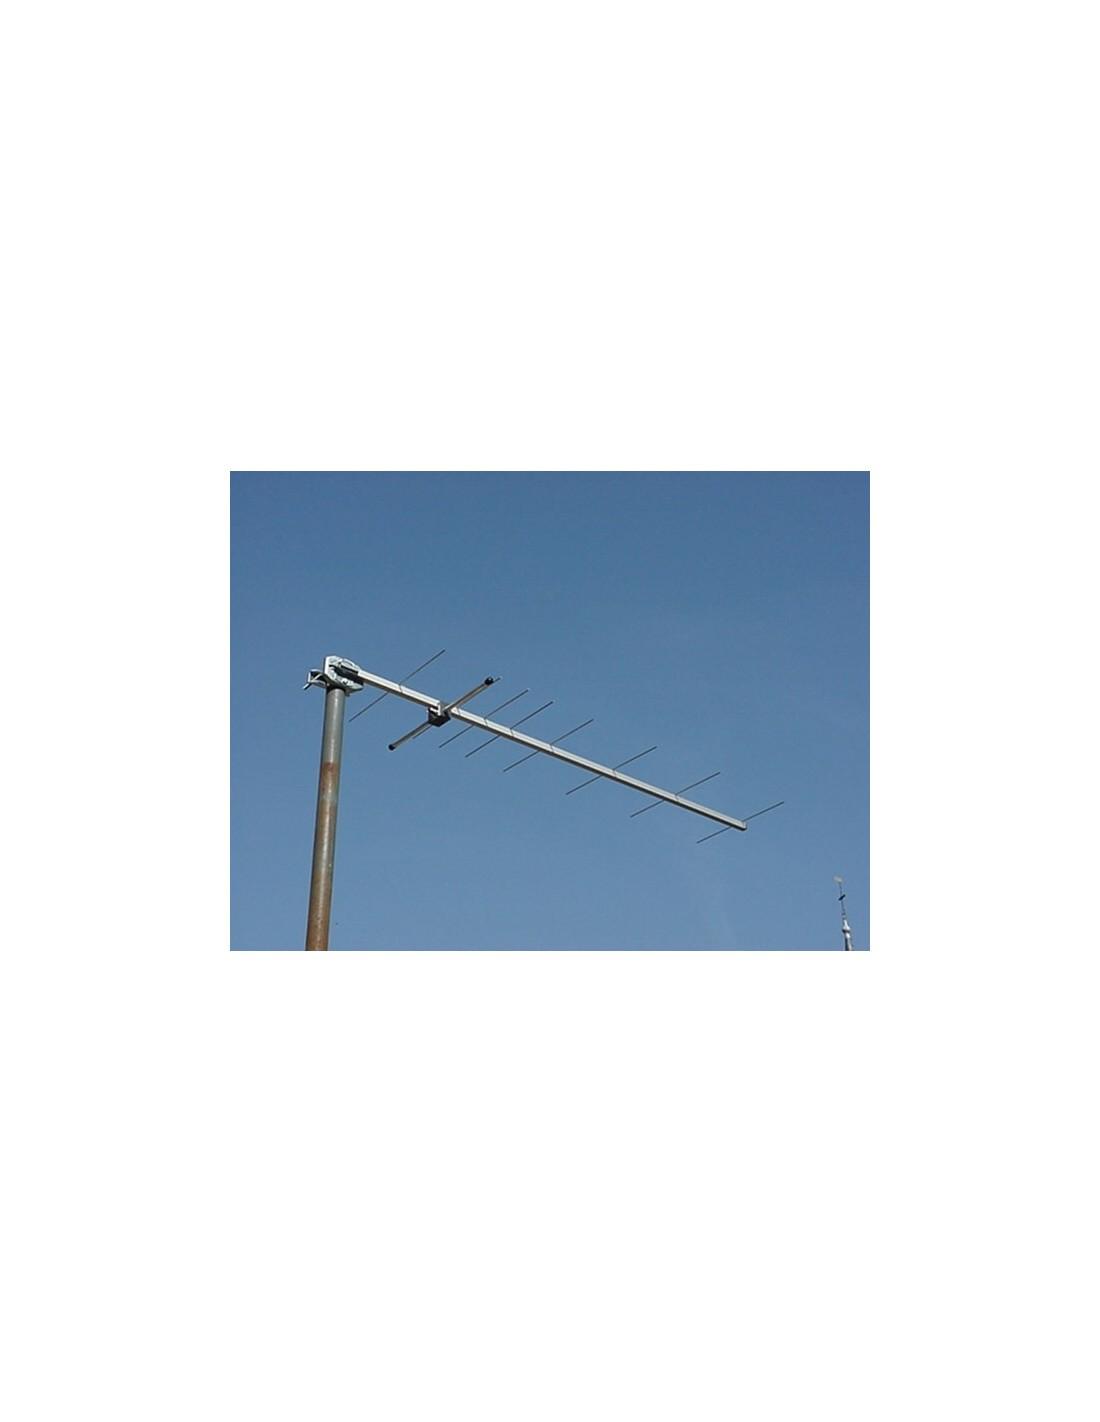 how to build a 440 mhz yagi antenna